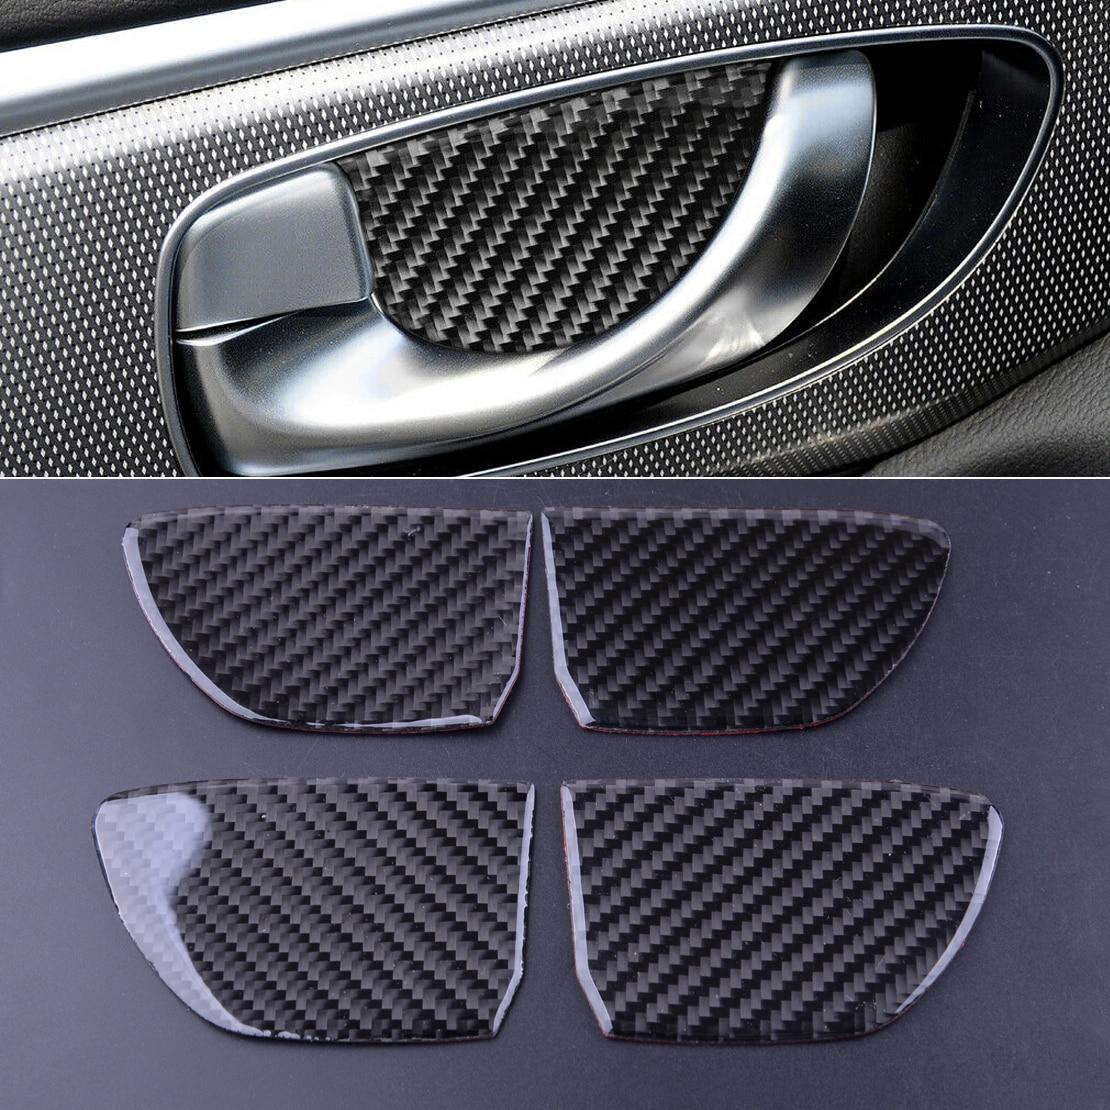 De fibra de carbono y 4 Uds manija de puerta Interior cubierta de cuenco Trim etiqueta apto para Infiniti Q50 Q60 2014, 2015, 2016, 2017, 2018, 2019